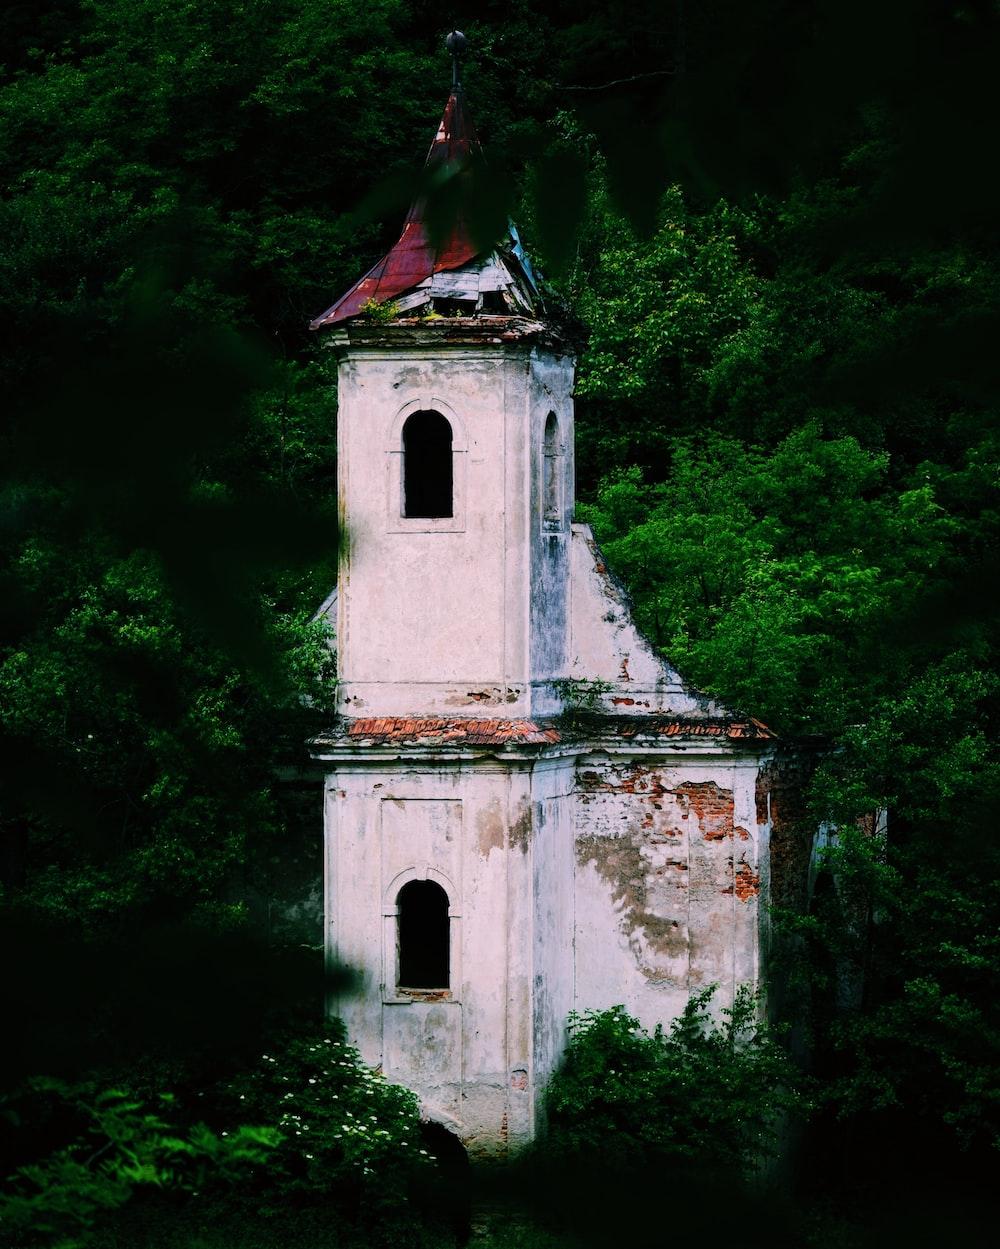 white concrete church near green trees during daytime